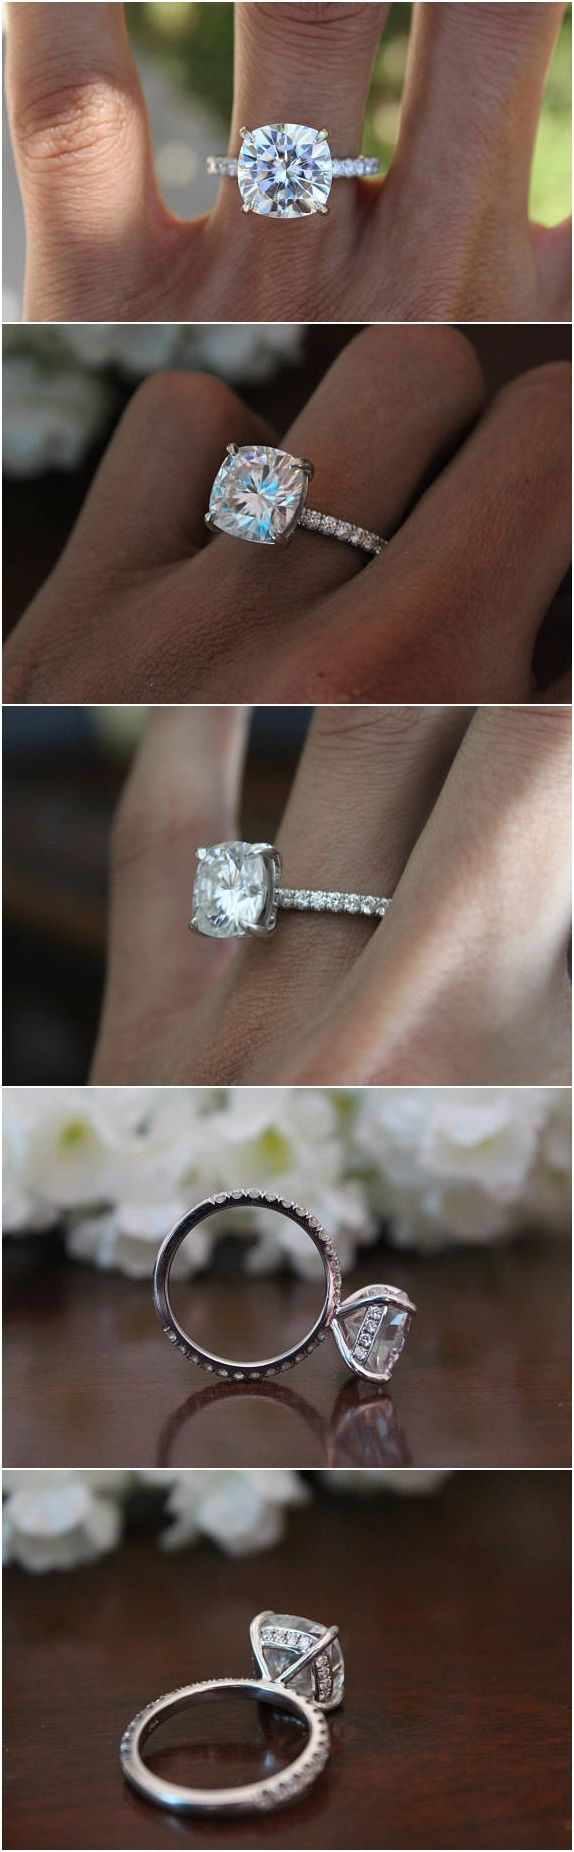 GIA 5 Carat Cushion Diamond & Hidden Halo Engagement Ring Platinum, Anniversary Rings for Women, 5ct Luxury Rings, Raven Fine Jewelers